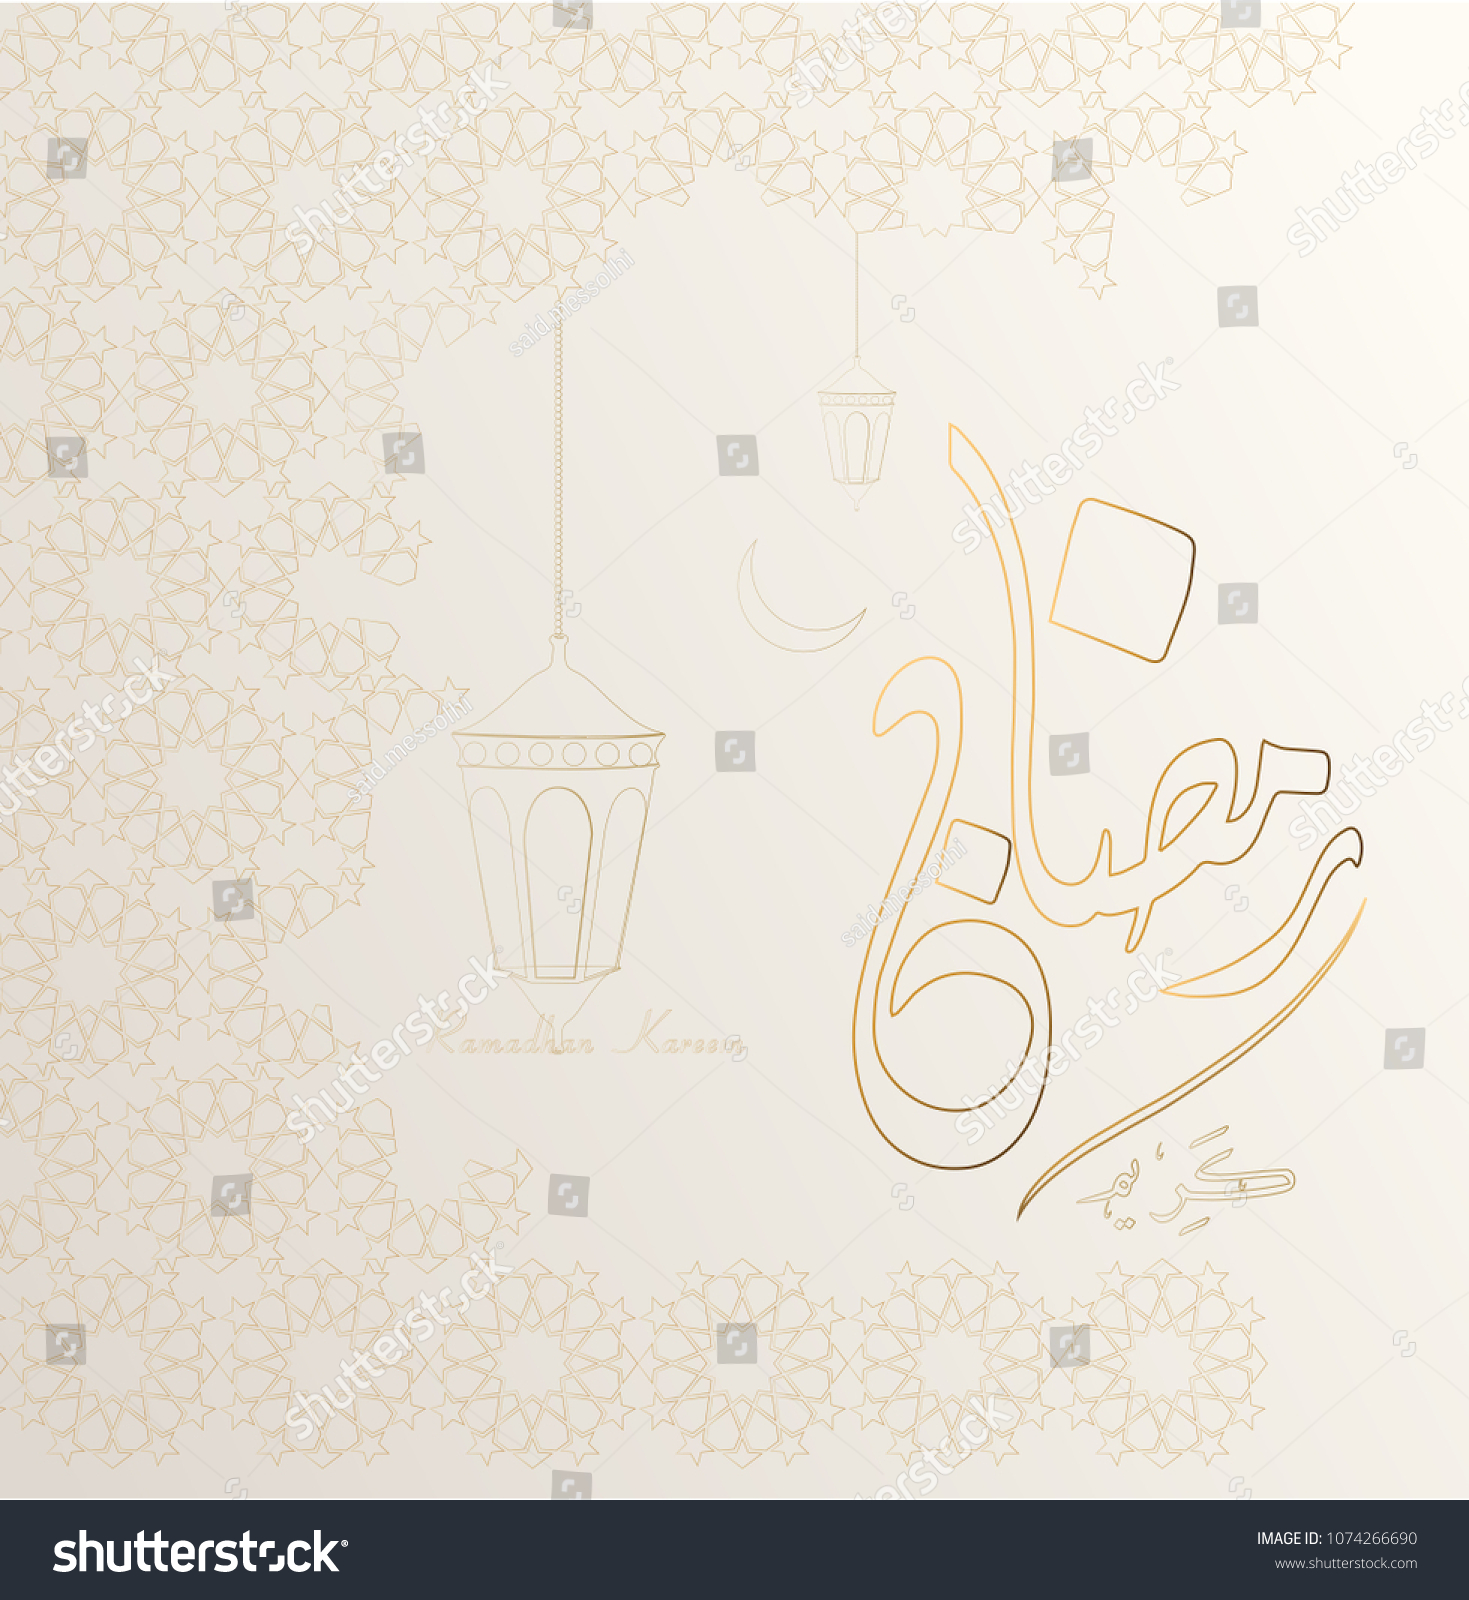 Ramadan Kareem Greeting Cards In Arabic Calligraphy Style (Translation Generous